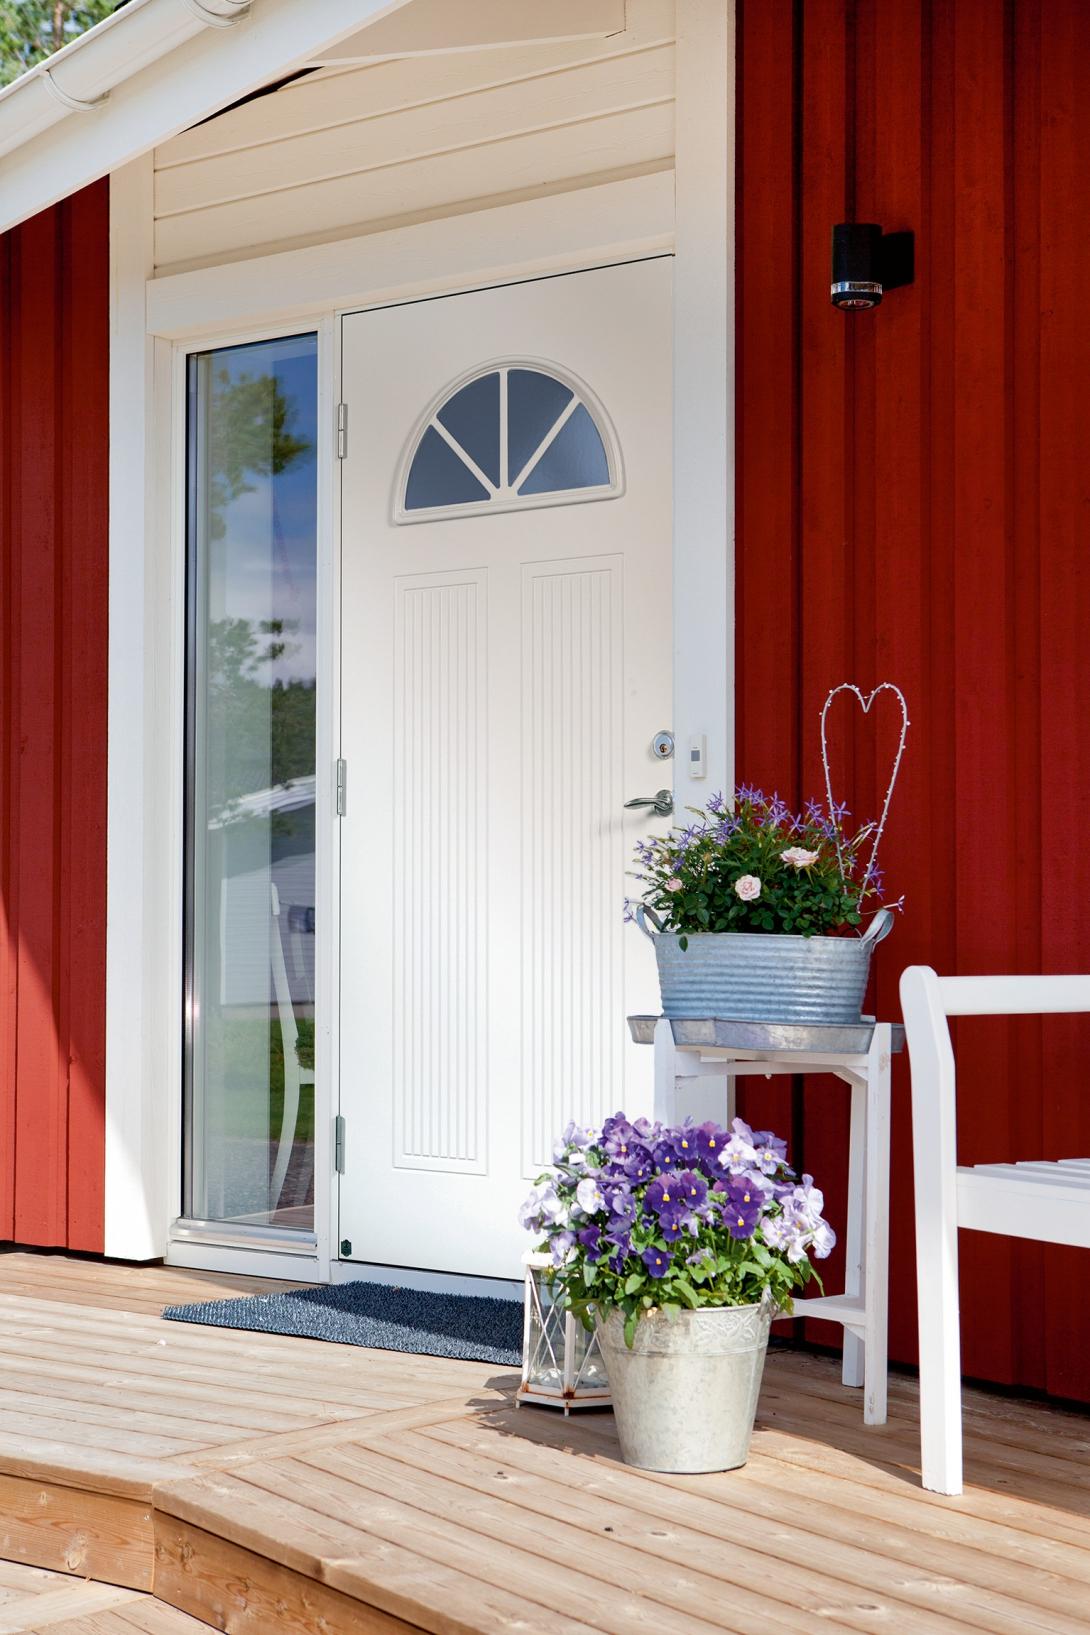 Bygg som proffsen - Ytterdörr Hedby